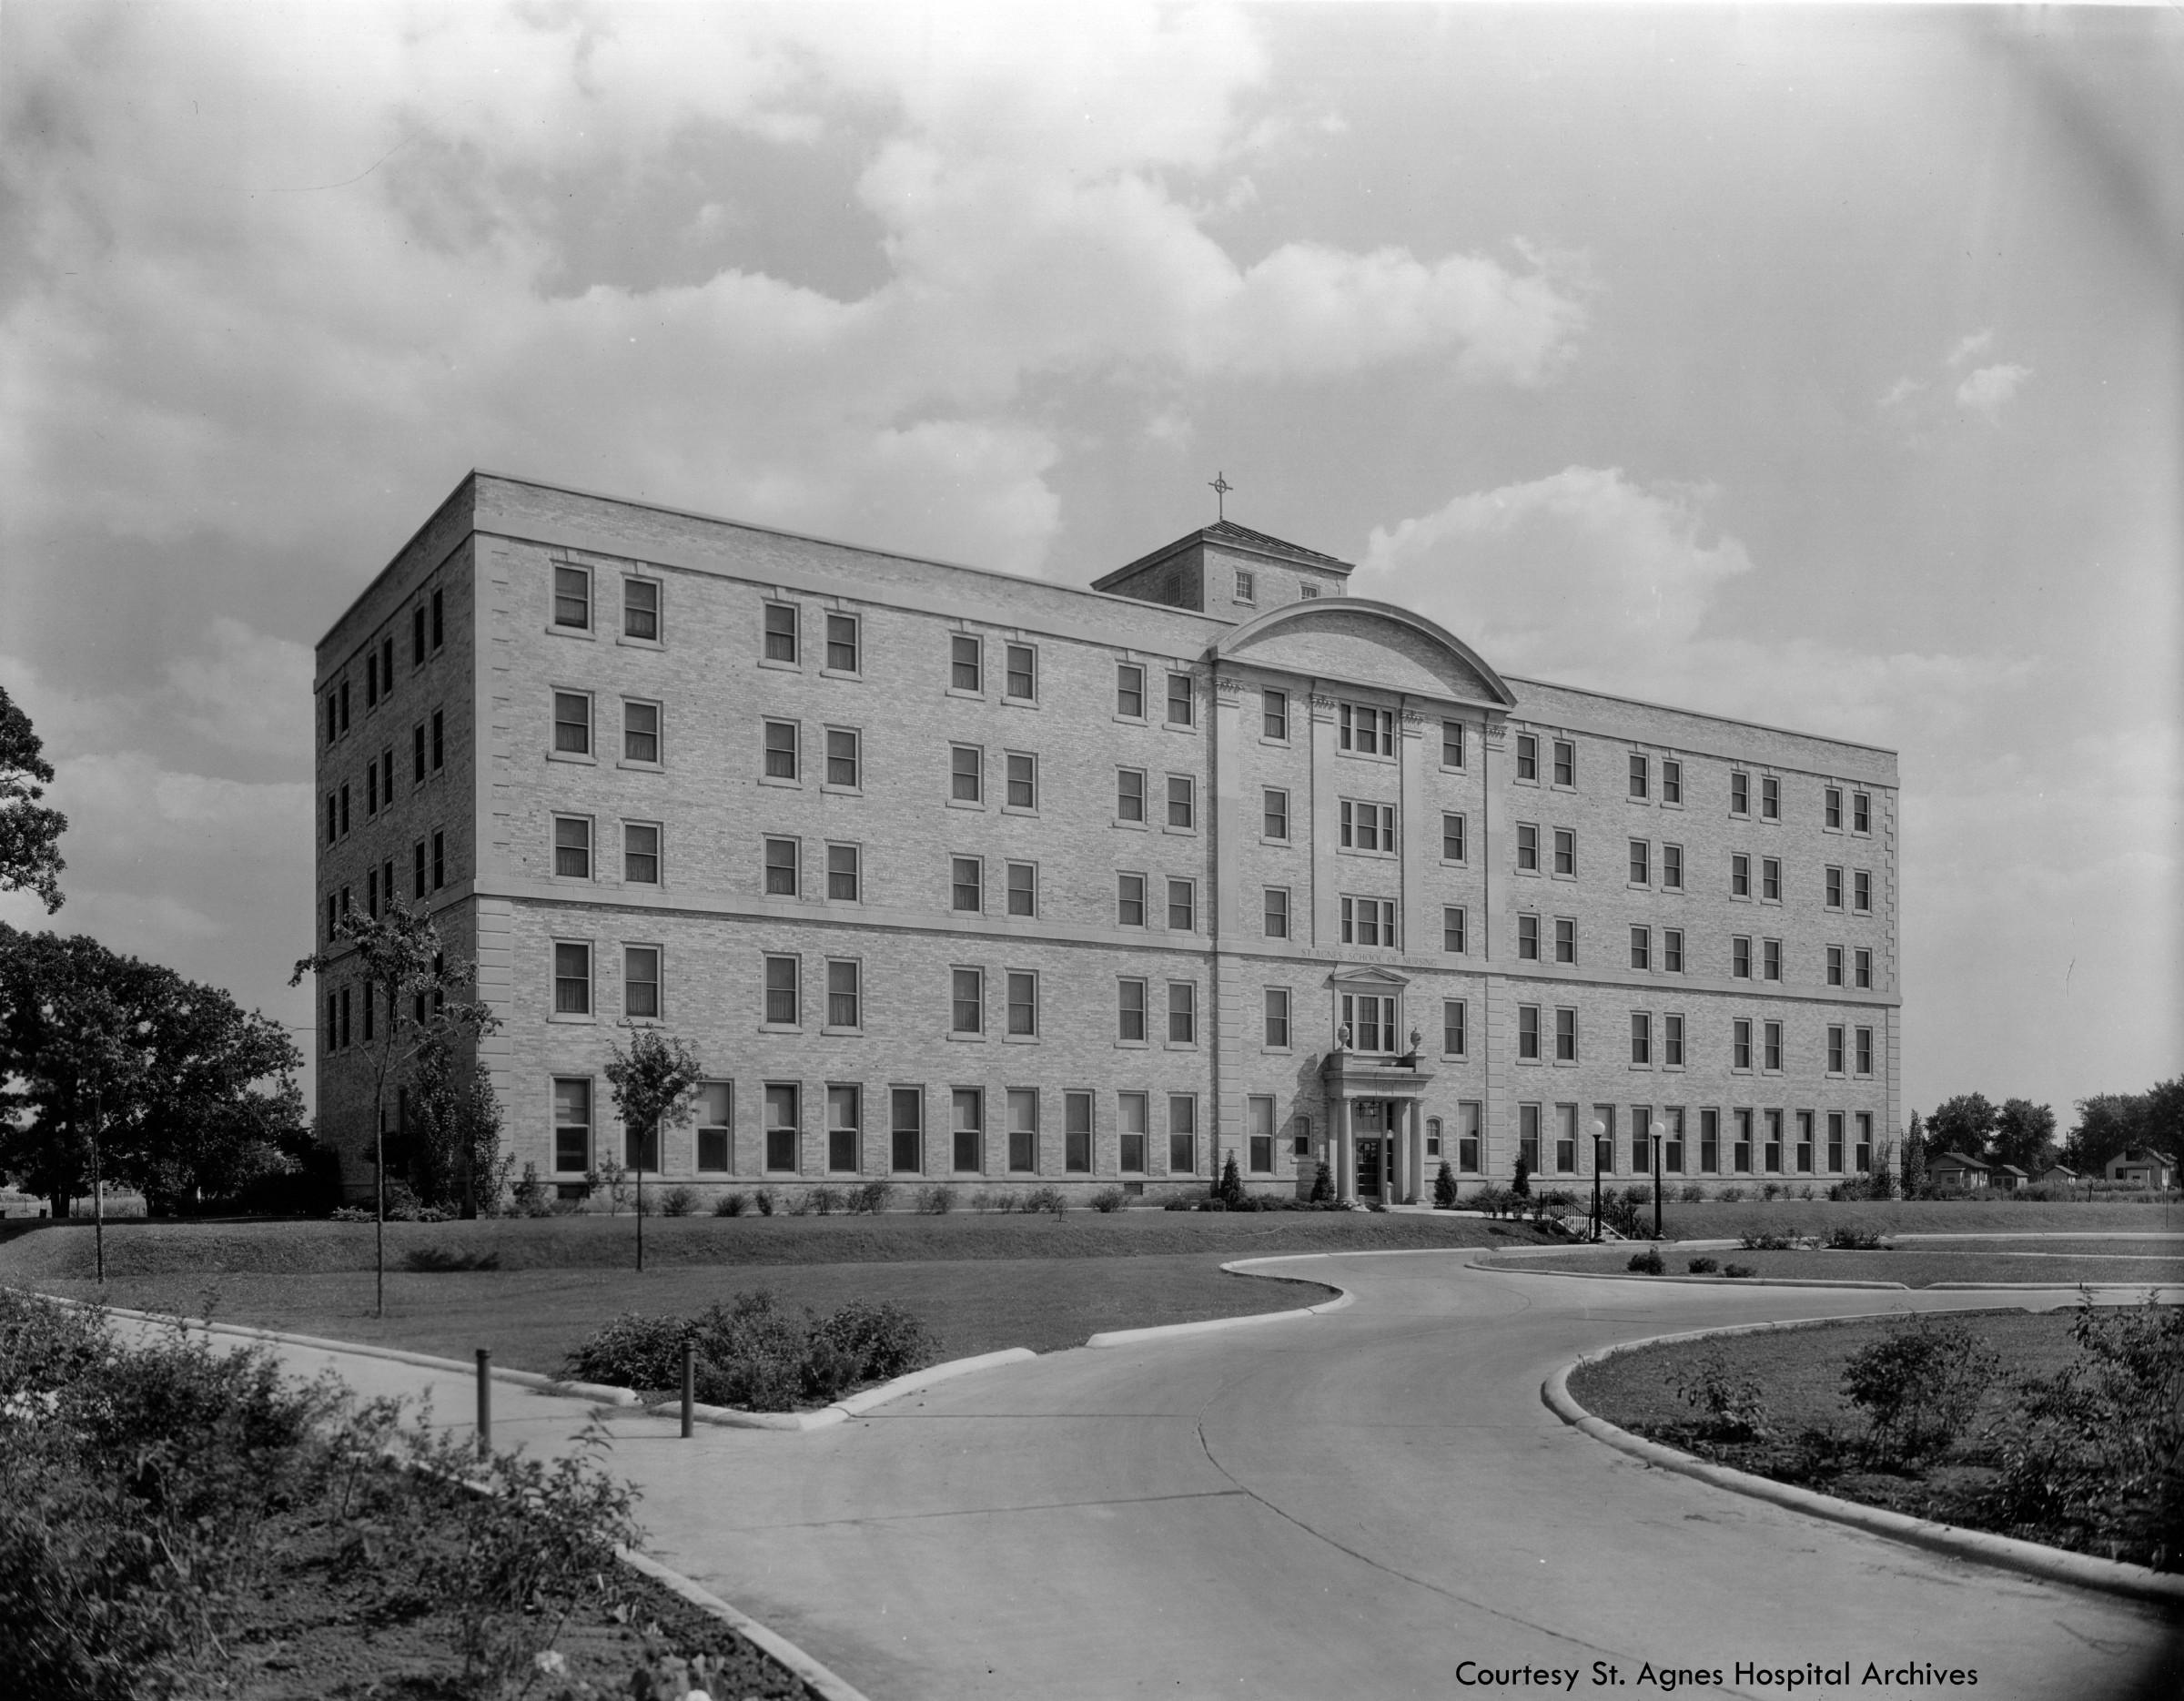 St. Agnes School of Nursing built in 1931.